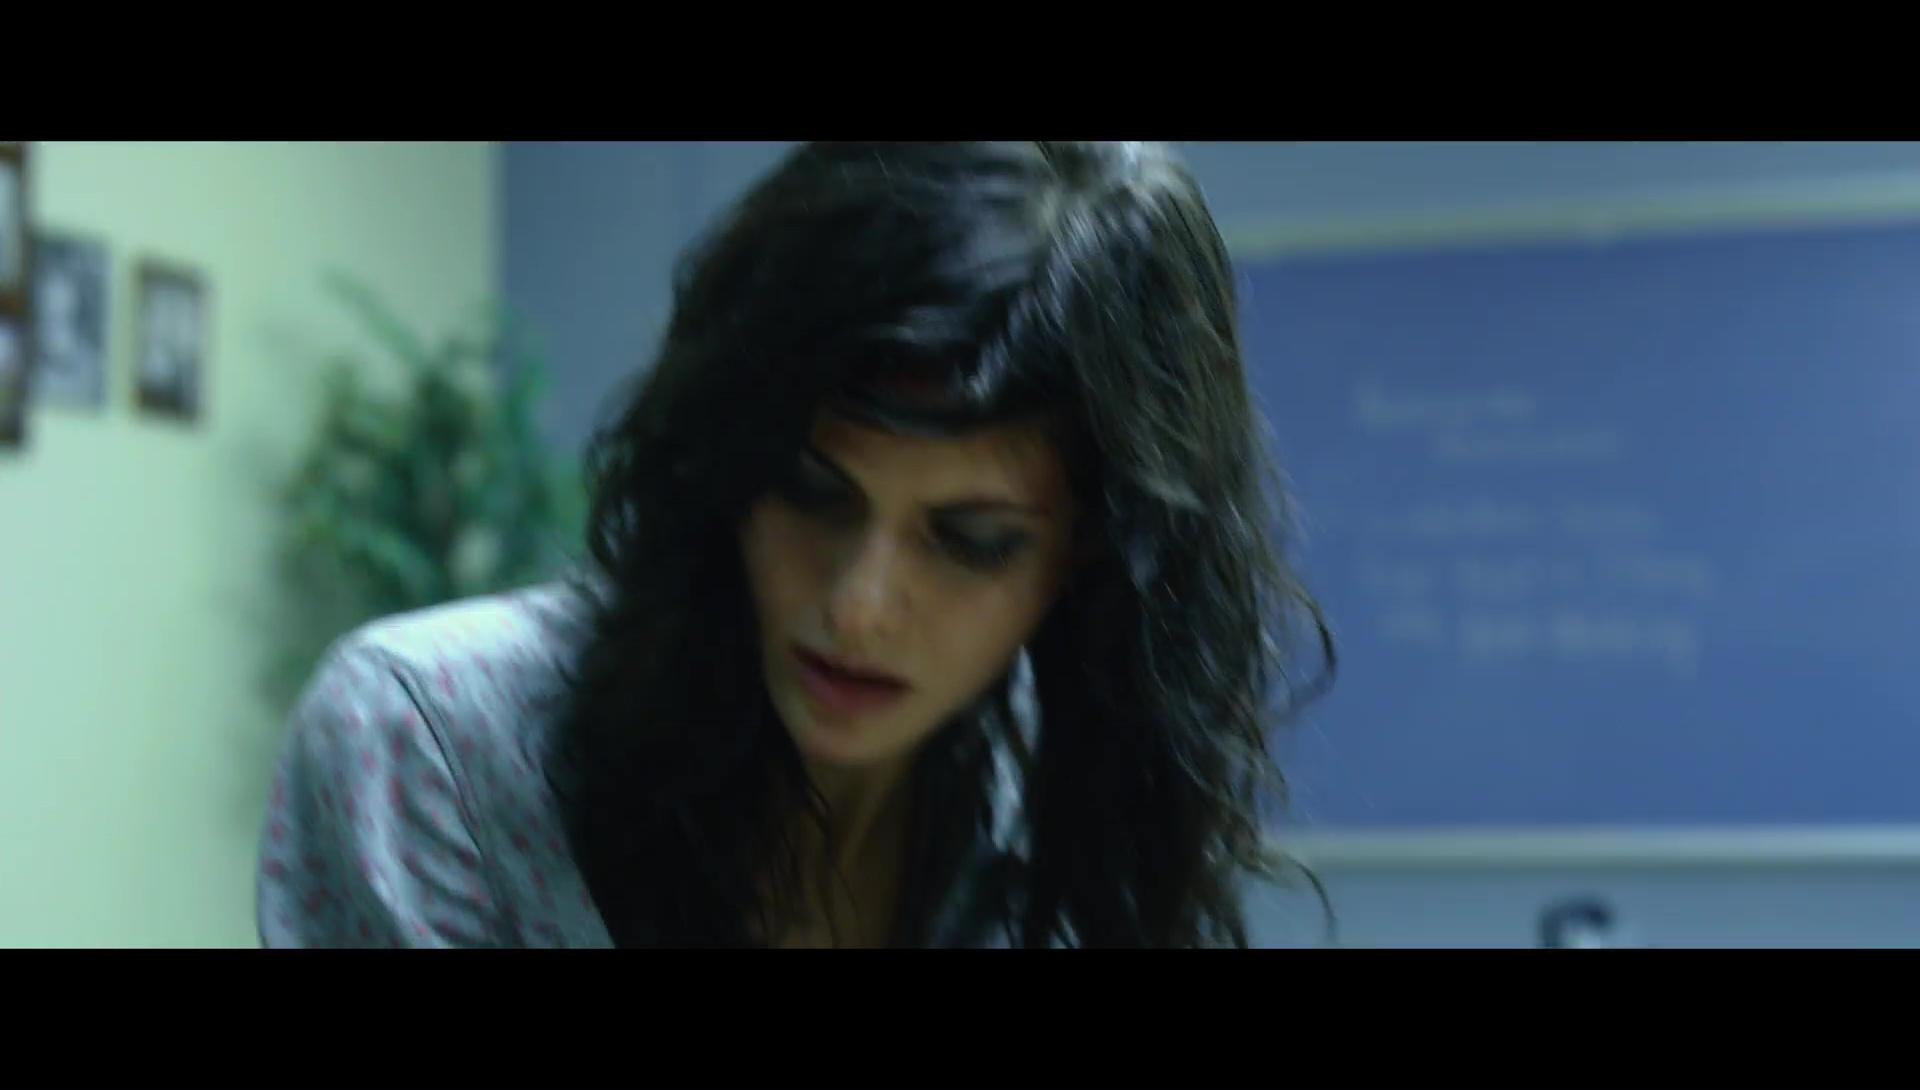 La Masacre De Texas Herencia Maldita 1080p Lat-Ing 5.1 (2013)